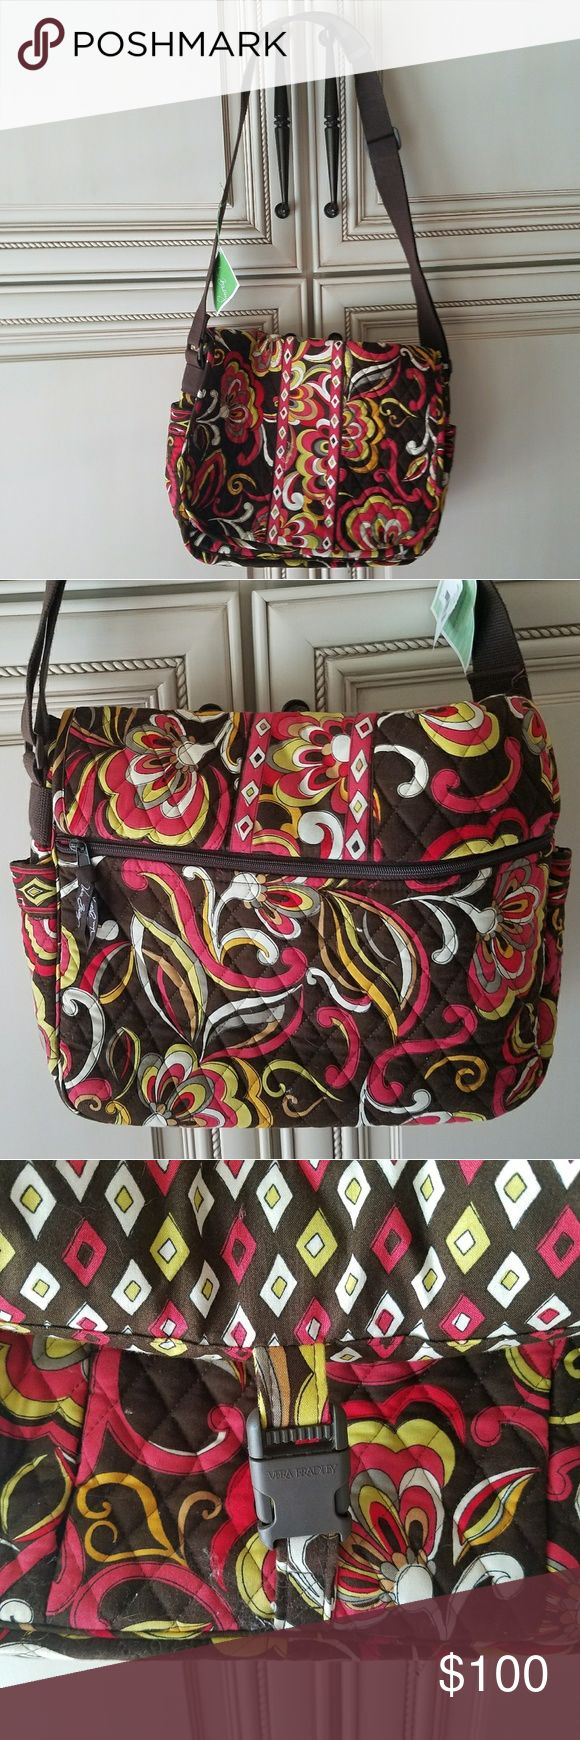 Vera Bradley Messenger Bag NWT Discontinued patten Brand new! Super cute, great as a baby bag too Vera Bradley Bags Shoulder Bags